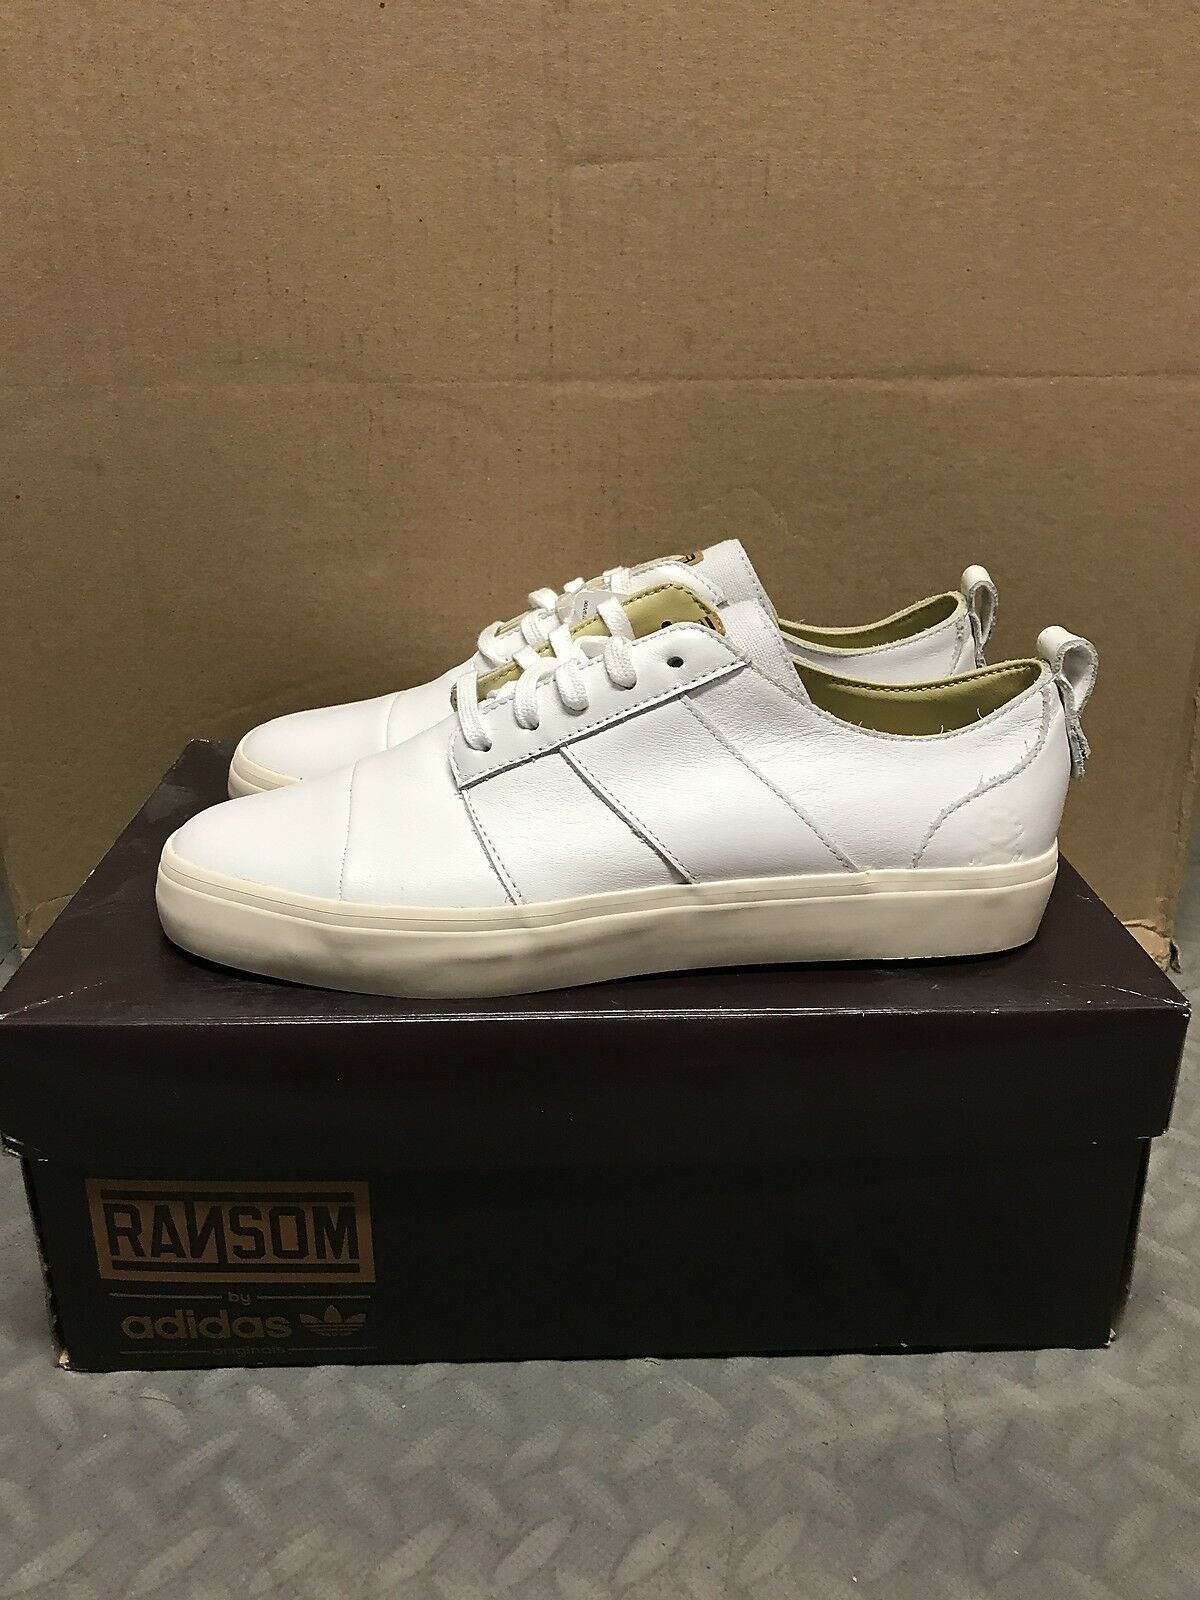 Adidas Originals X Ransom Army Tr Lo Runners Sneakers Mens New Bone White Q20898